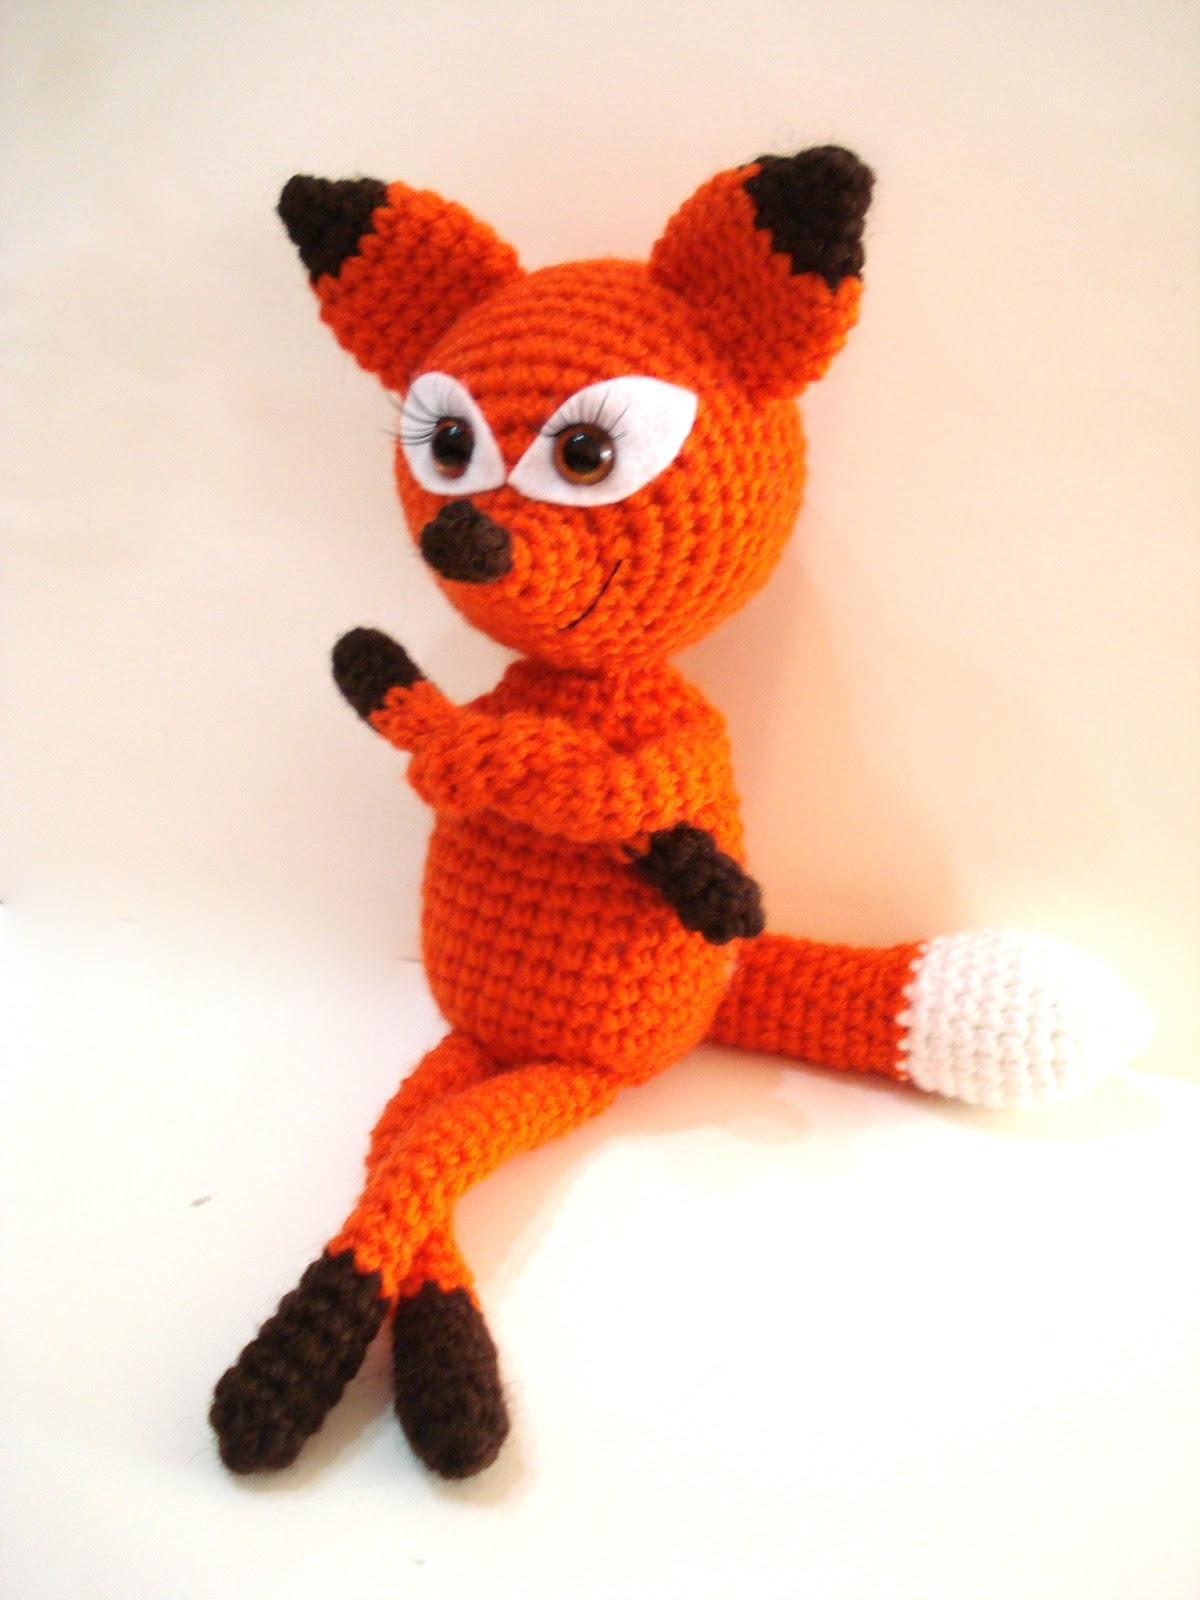 AllSoCute Amigurumis: Amigurumi Fox, Crochet Fox Pattern